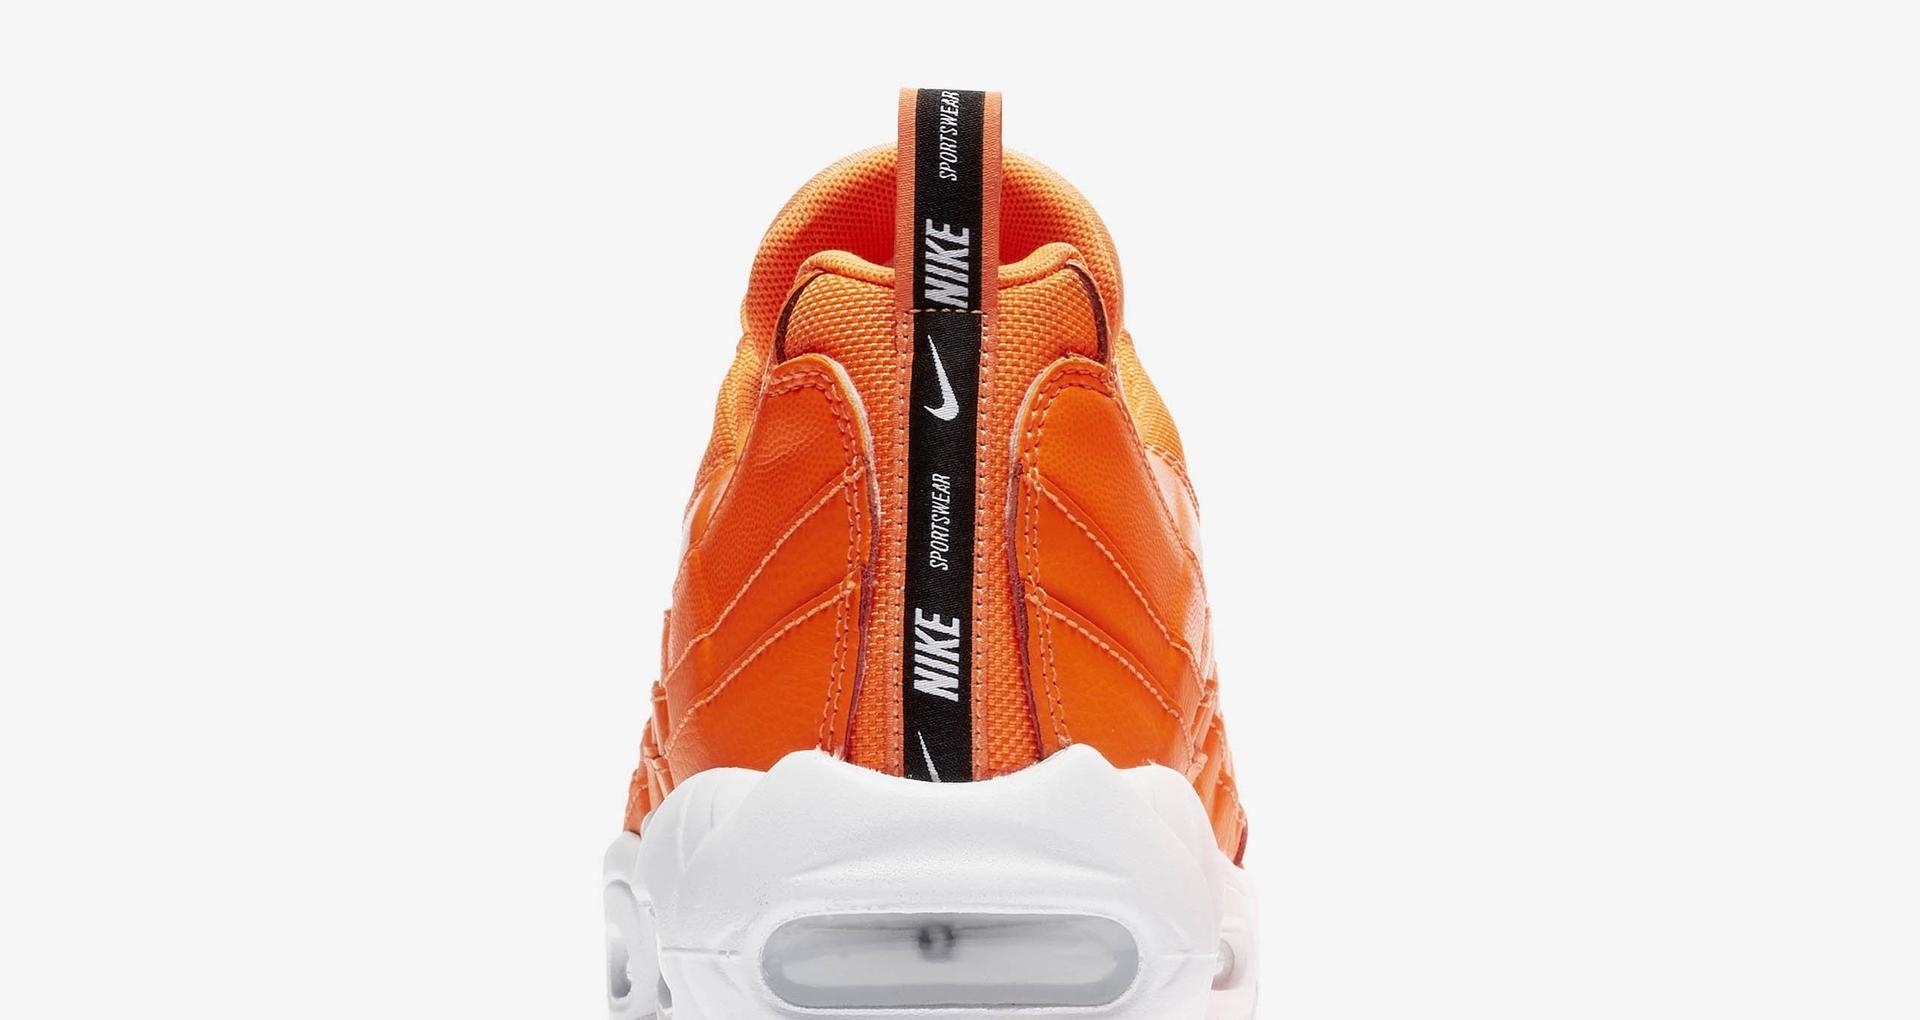 Air Max 95 PRM Total Orange, Black & White